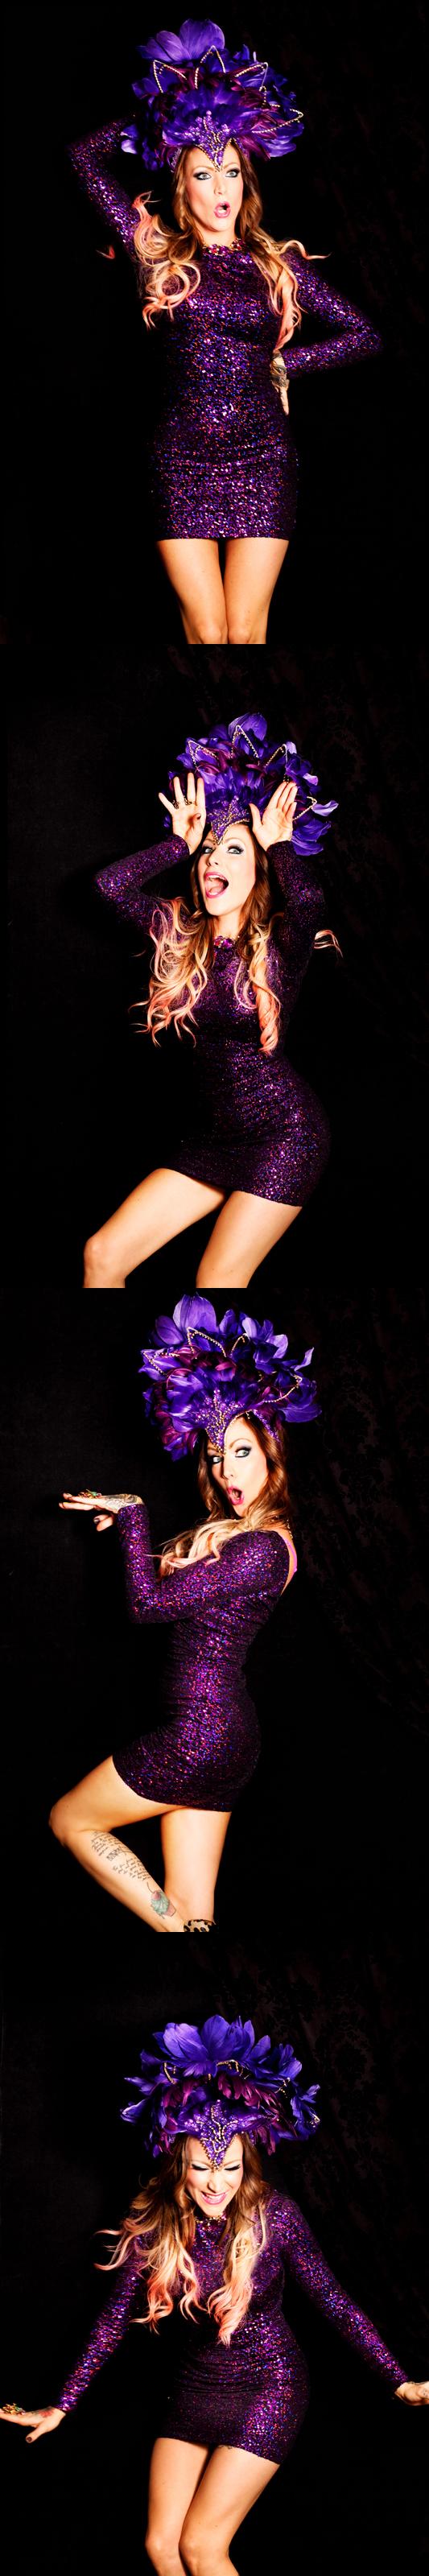 purple showgirl